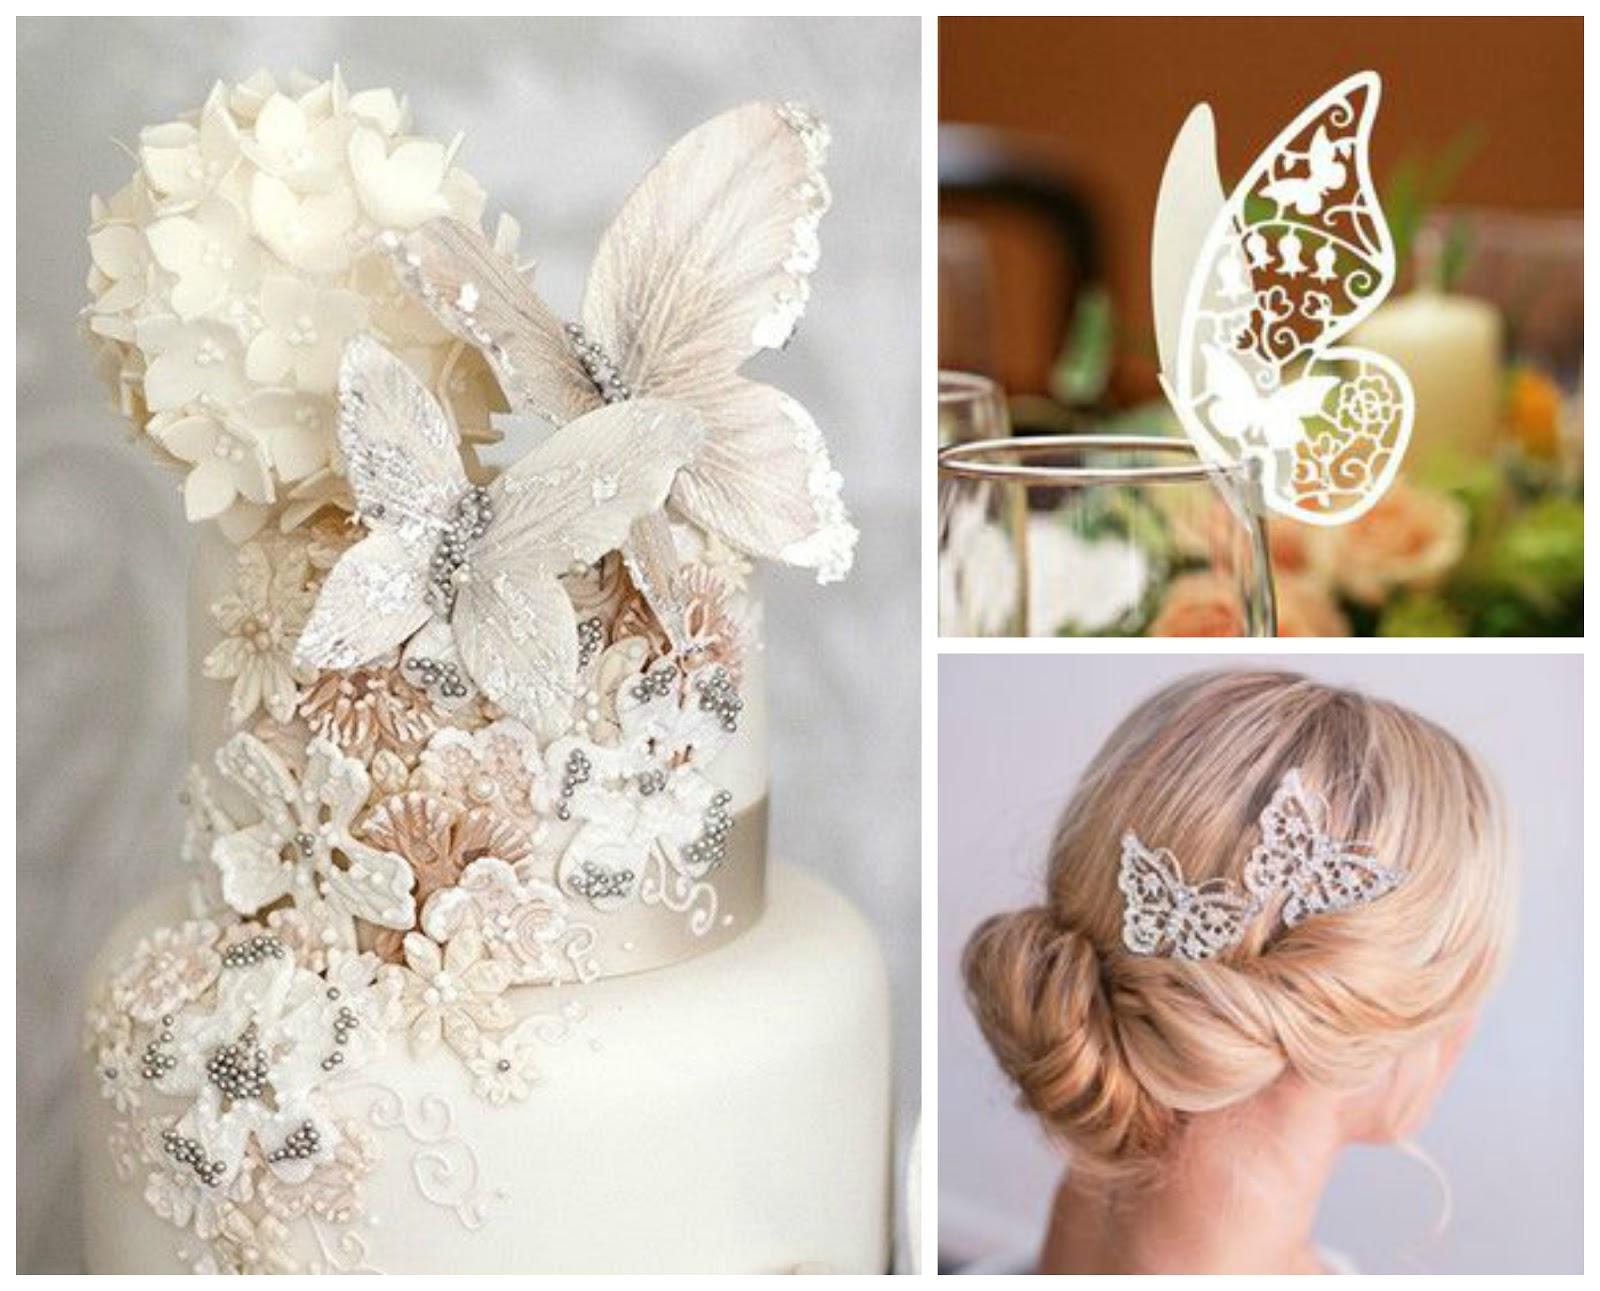 Matrimonio Tema Tatuaggi : Matrimonio ecologico tutto per il a tema farfalle